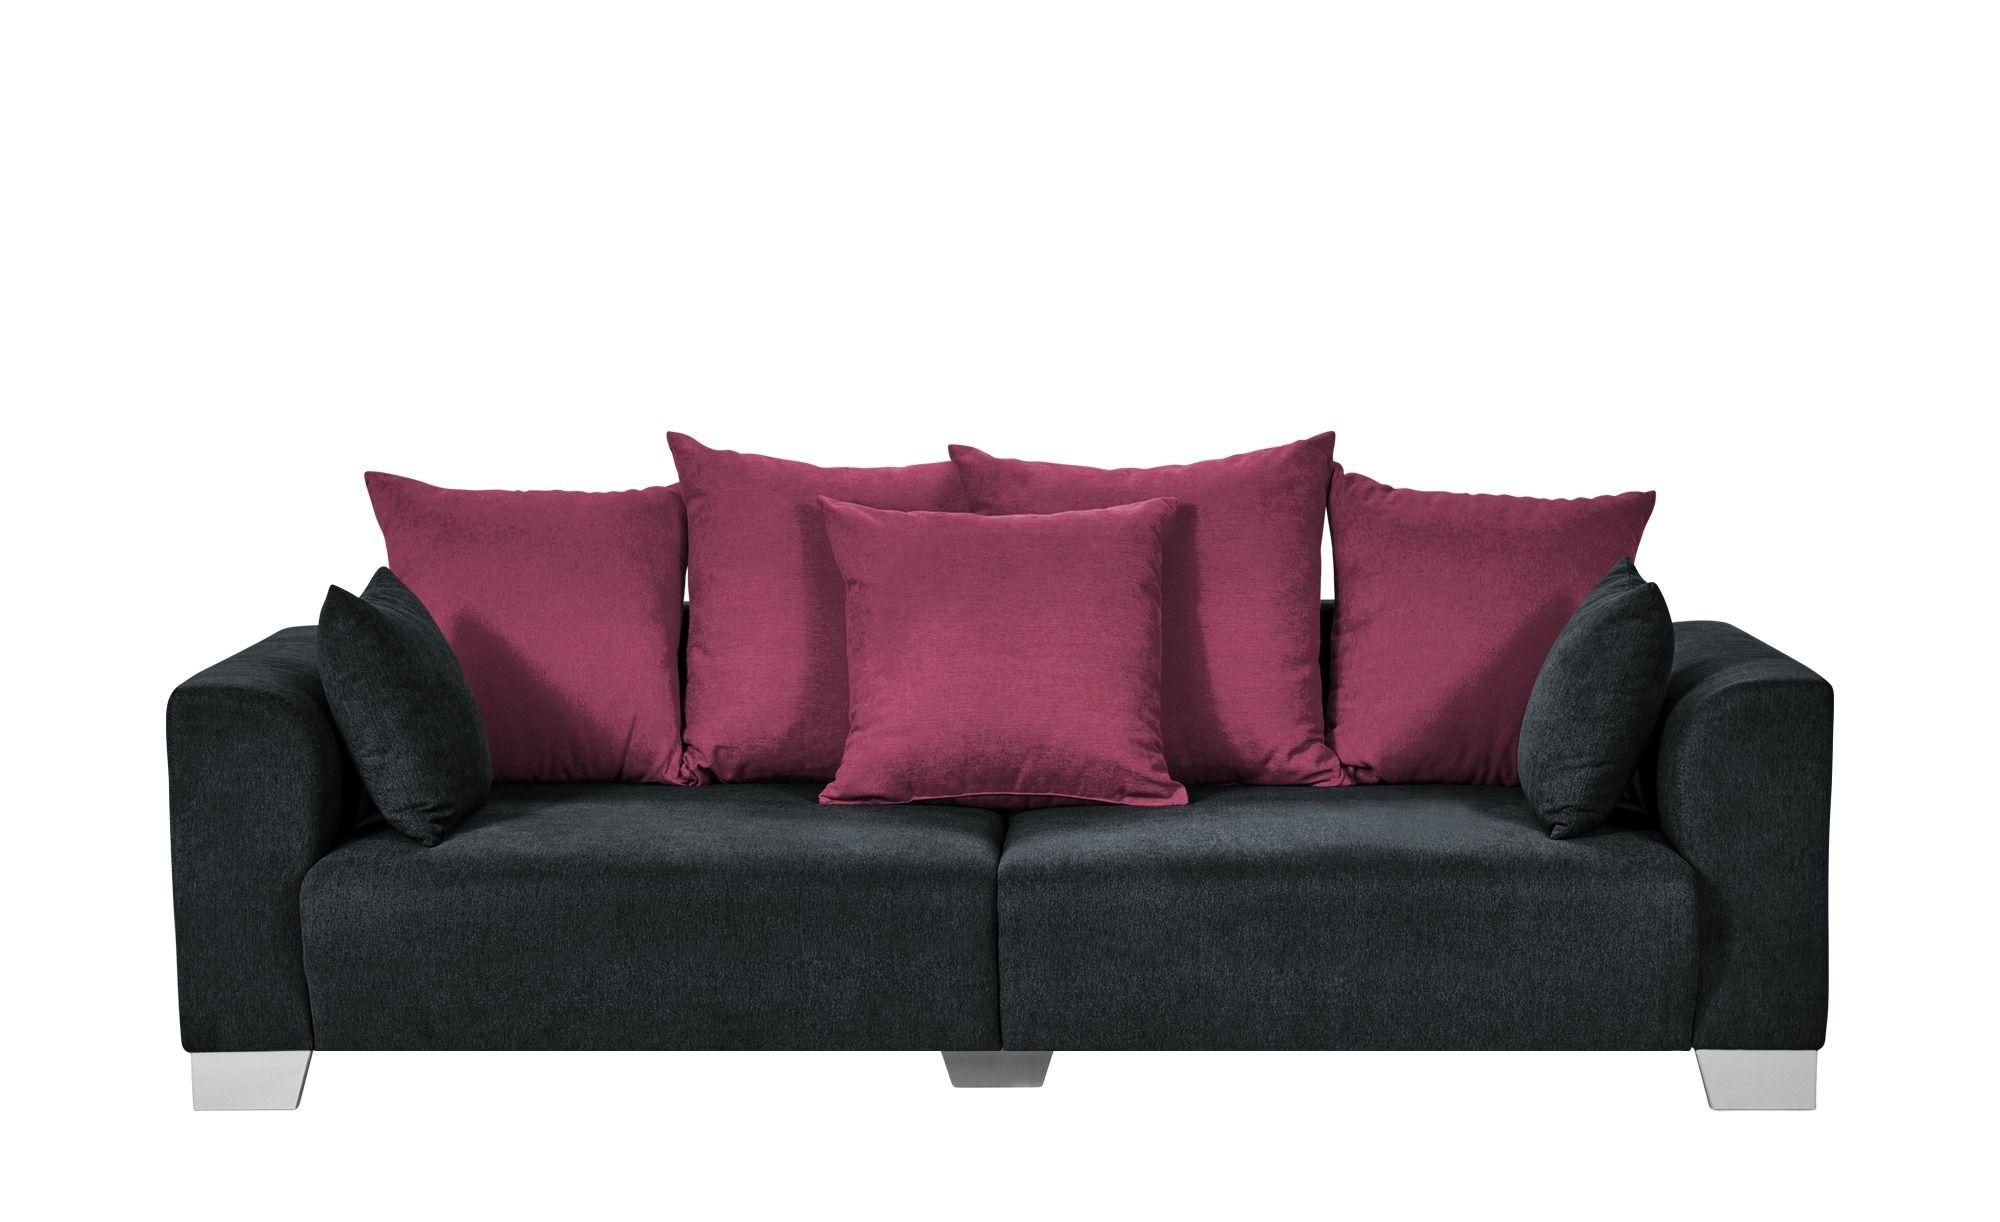 Smart Big Sofa Schwarz Webstoff Tonja Schwarz Masse Cm B 244 H 68 T 107 Polstermobel Sofas Big Sofas Big Sofa Kaufen Sofa Leder Schwarzes Sofa